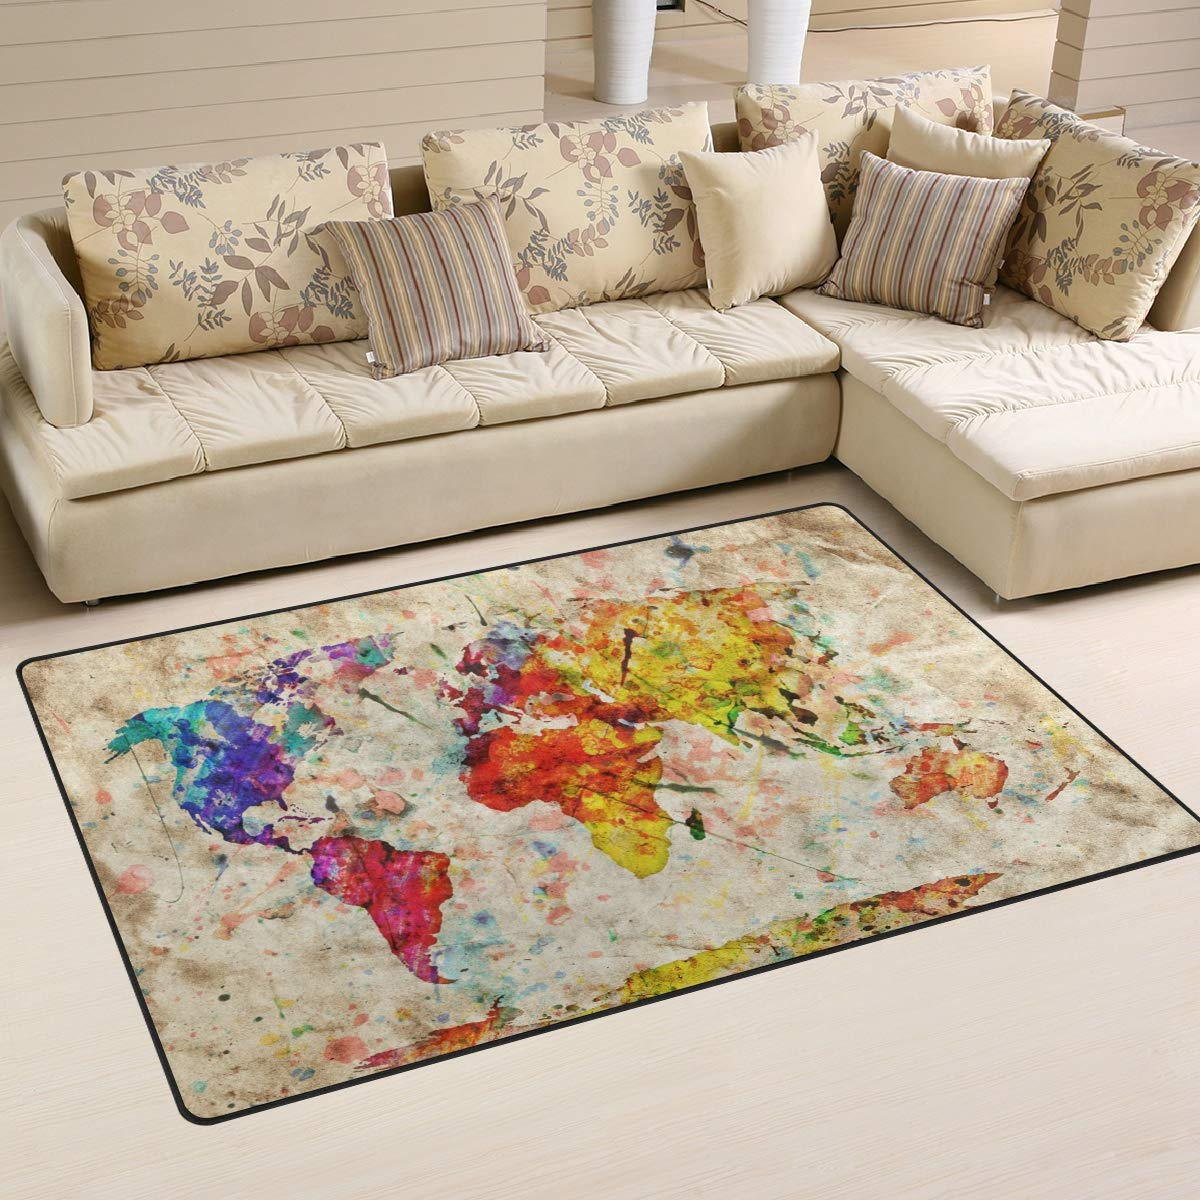 ALAZA Home Decor Dabbing Unicorn Rainbow Purple Galaxy Area Rug Carpet Rugs Floor Carpet Mat Living Room Carpet for Girls Room Home Indoor Decor 3x5